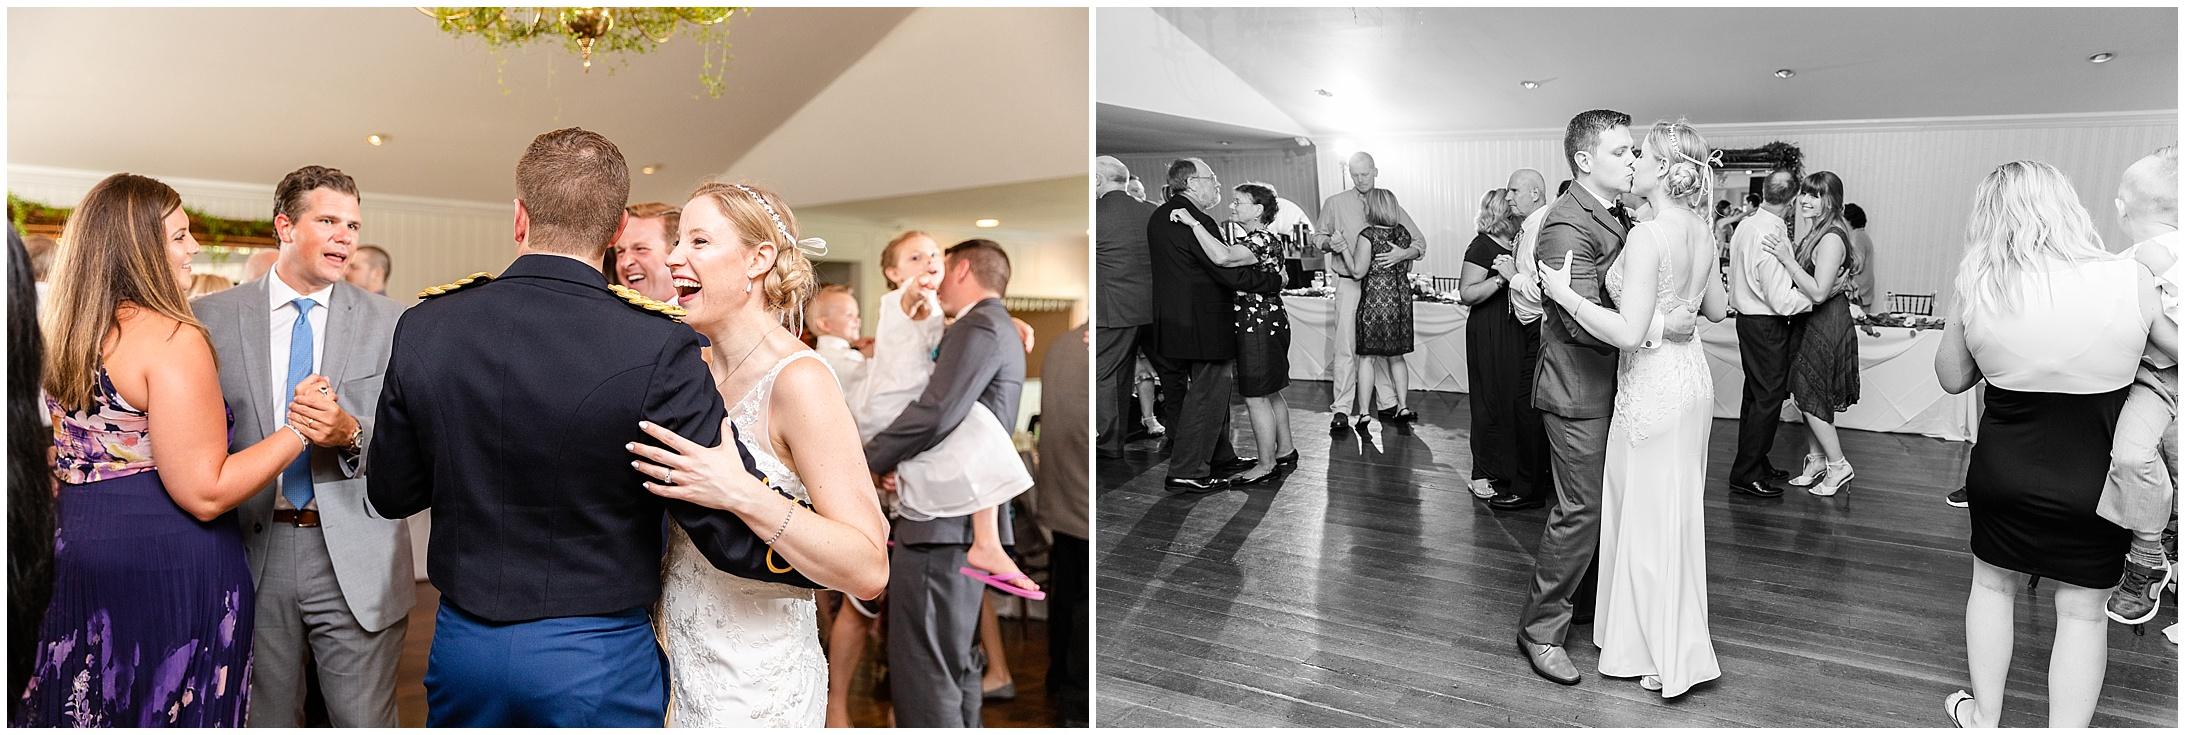 Antrim-1844-wedding-photos_0469.jpg